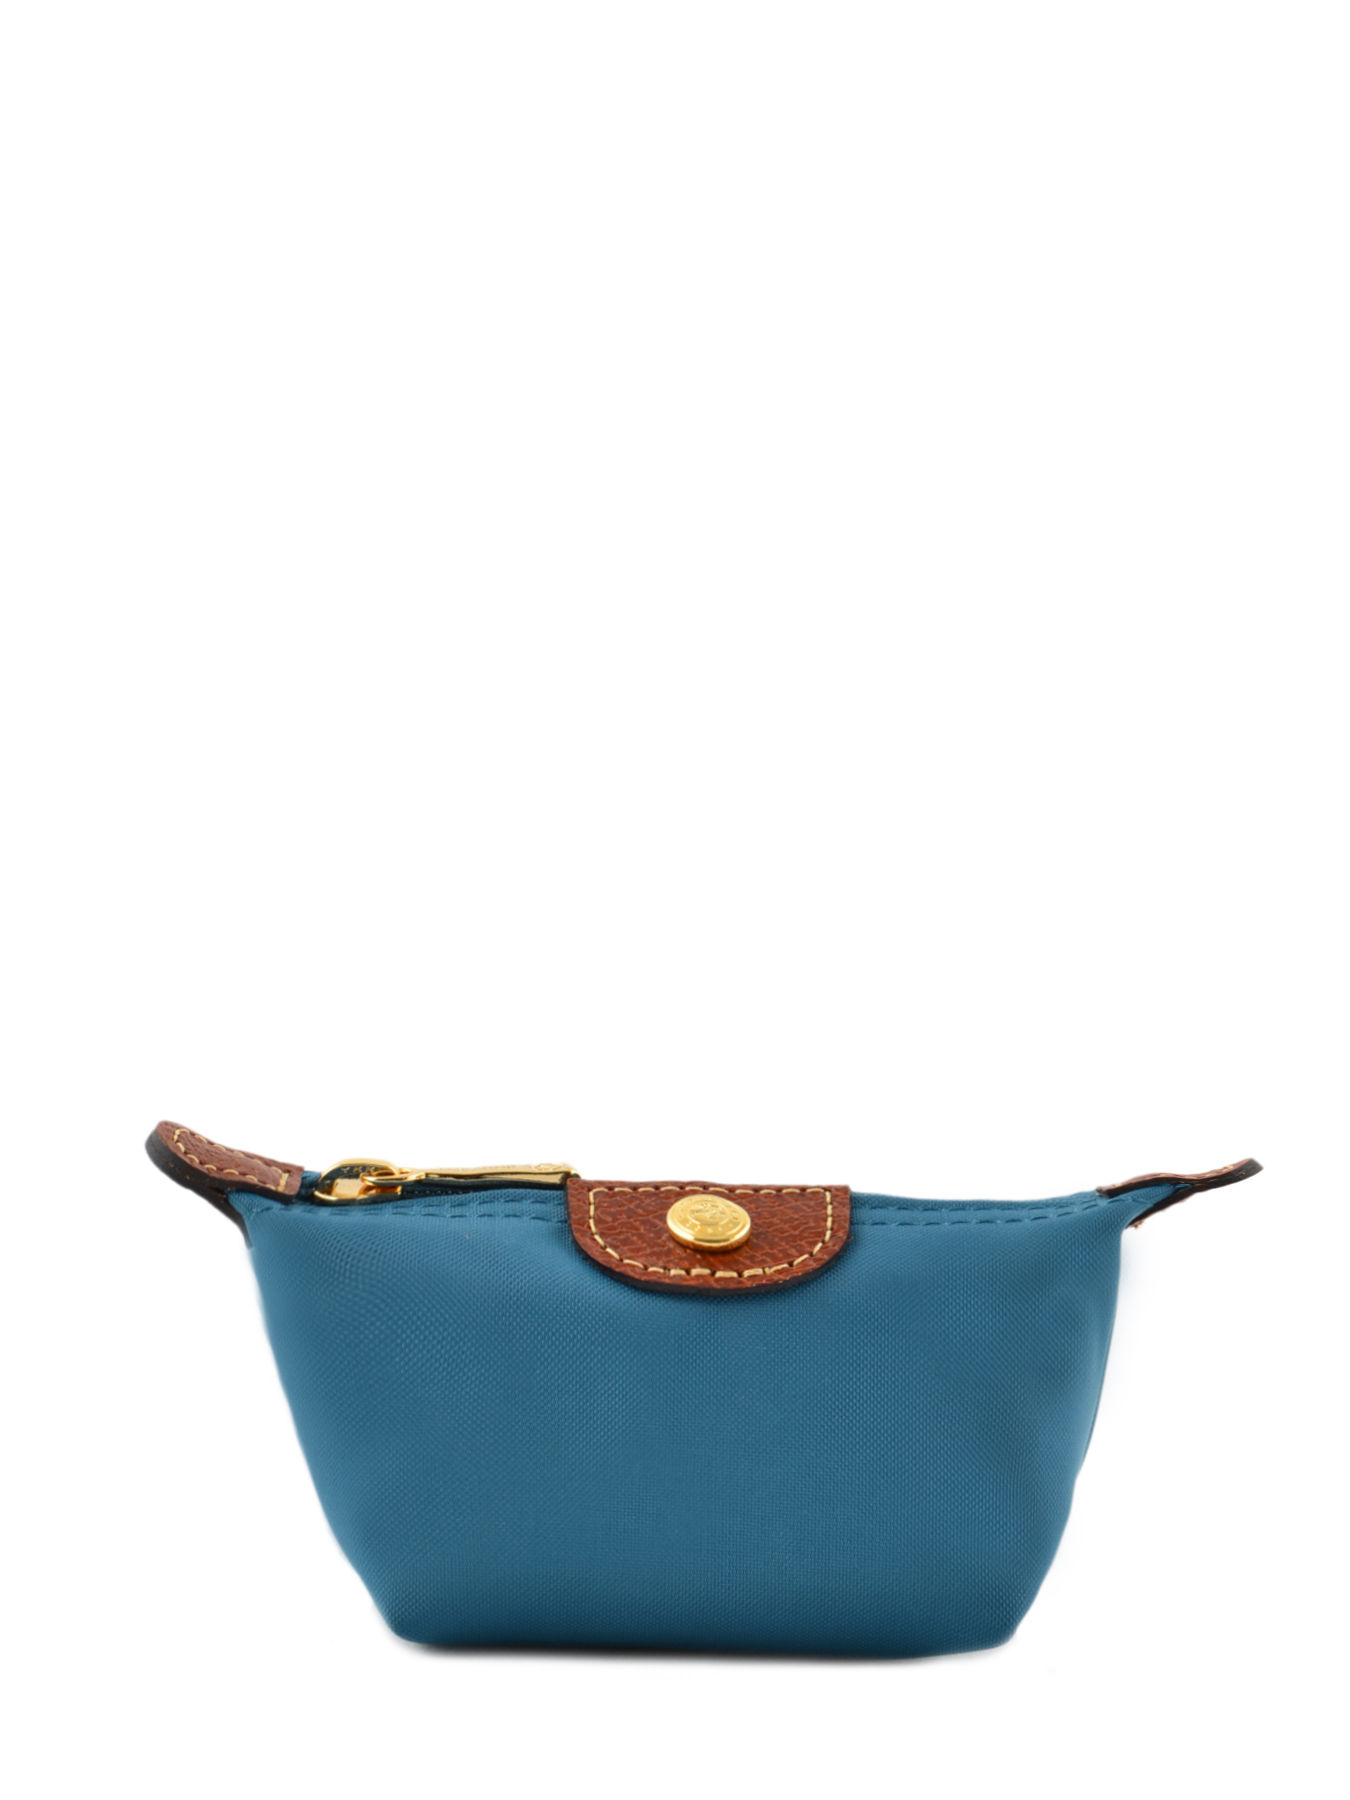 Longchamp Le pliage Porte monnaie Bleu